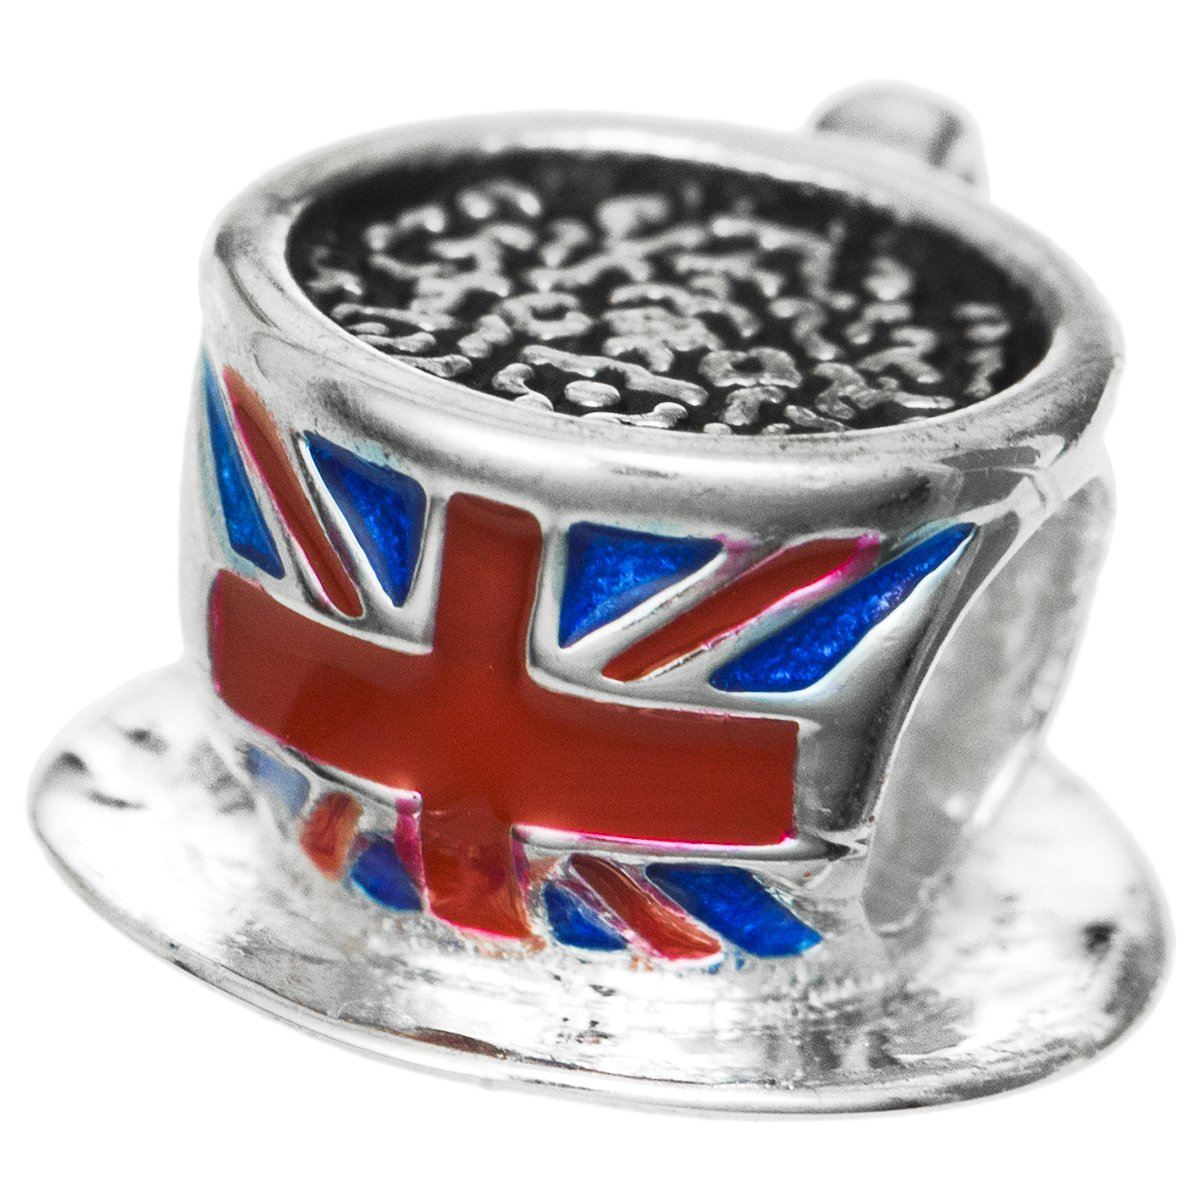 925 Sterling Silver UK British Flag Drink Cup Earl Tea Coffee Britain Enamel Bead For European Charm Bracelet Dreambell PB0668BX1